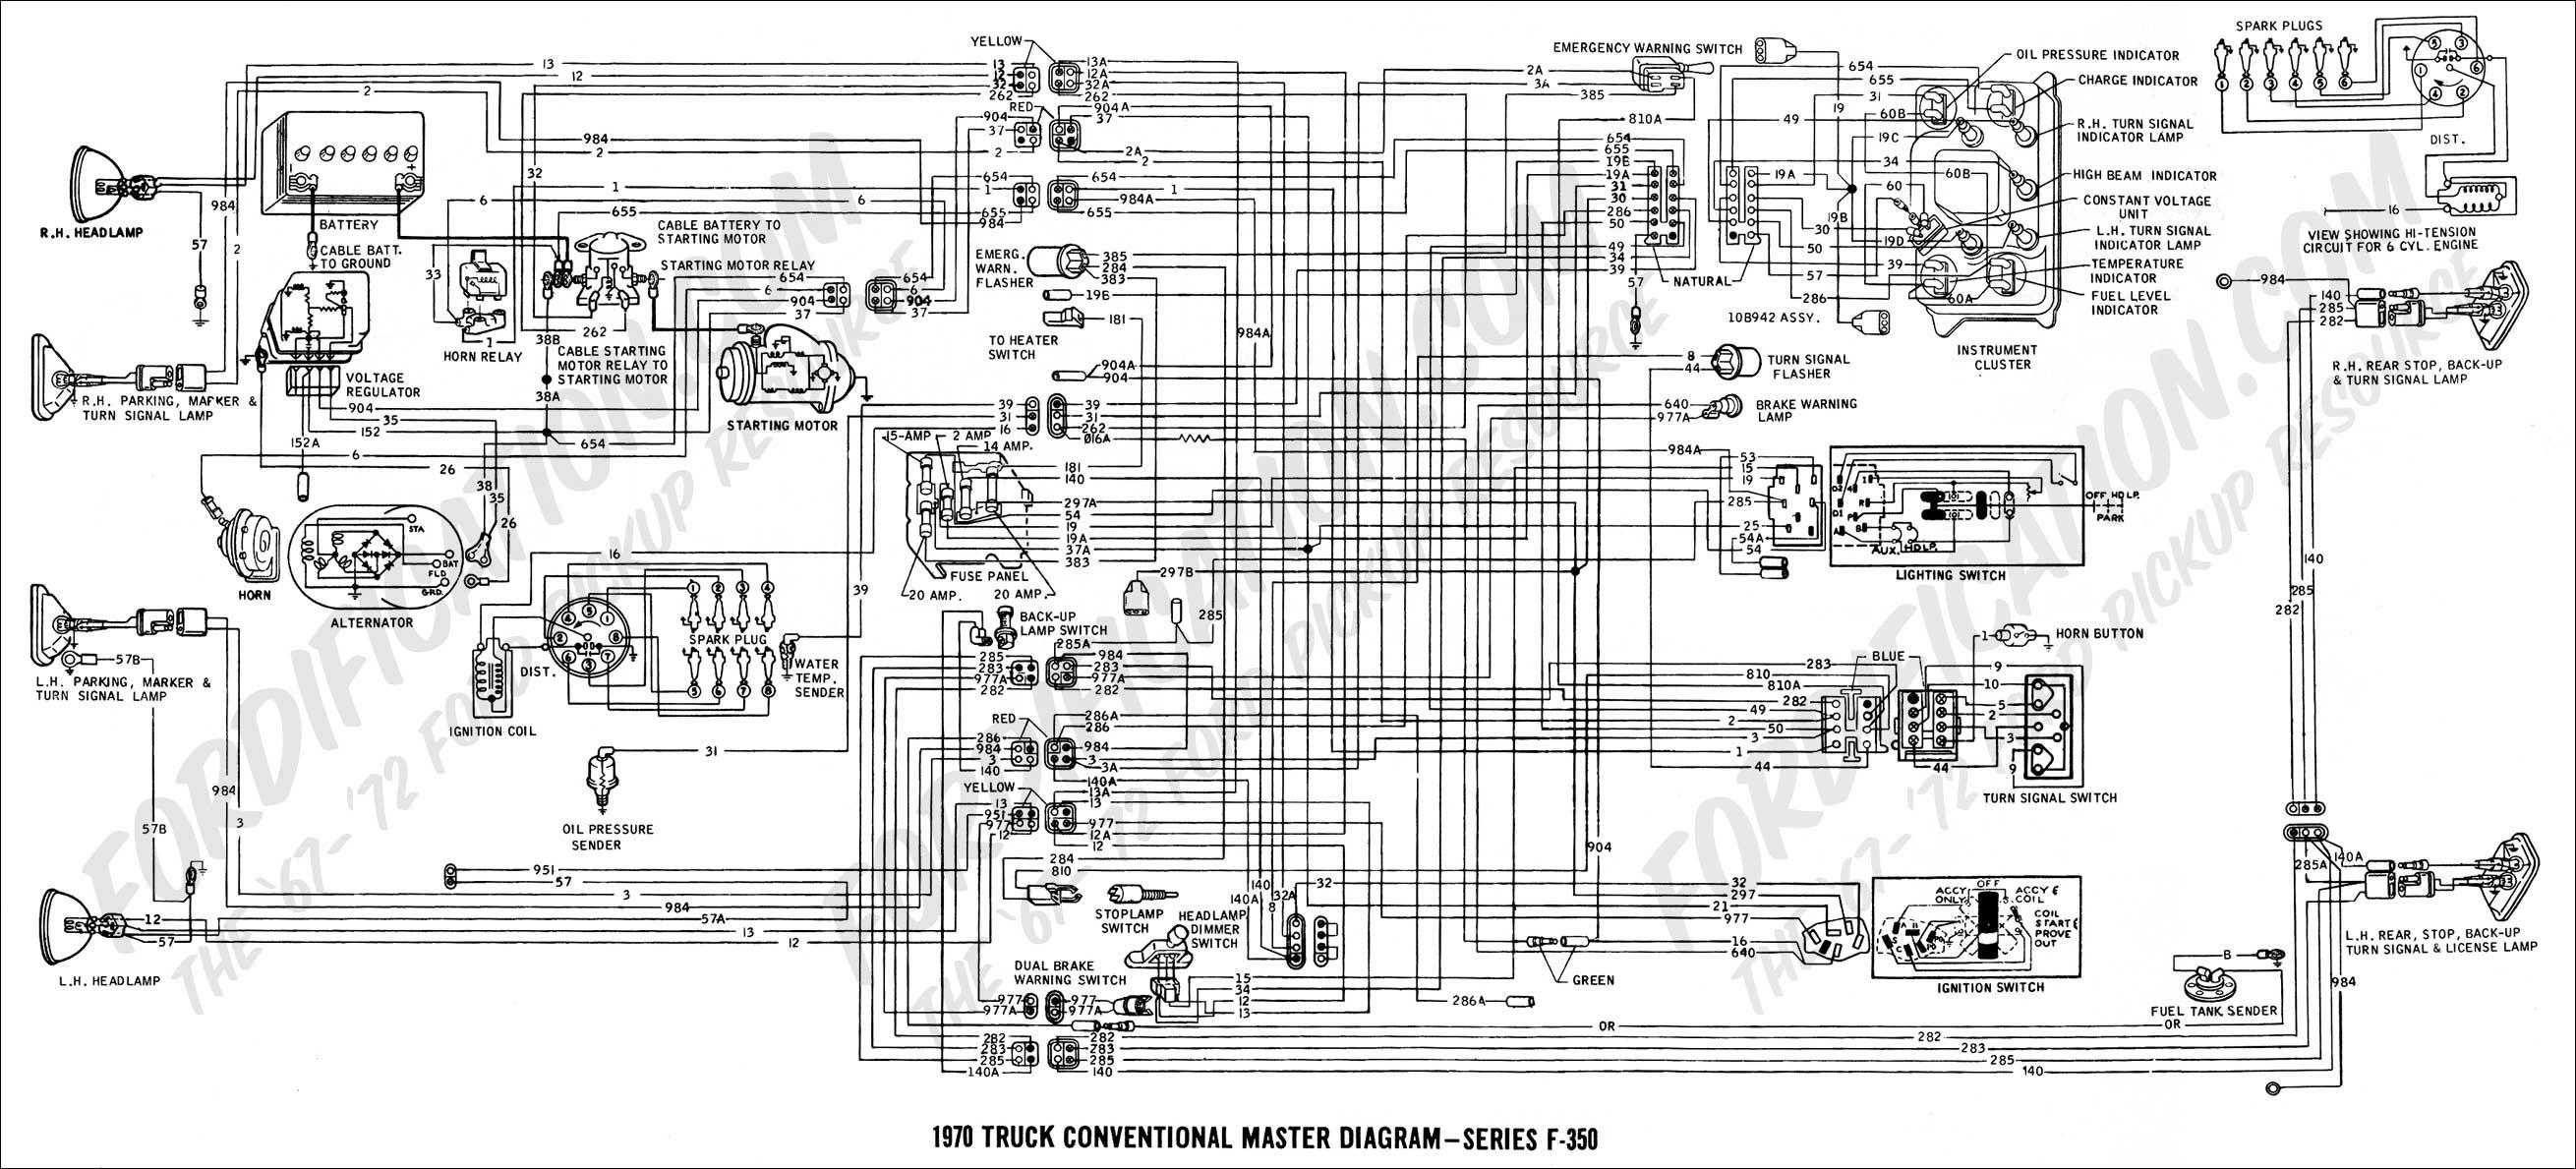 1969 Chevy C10 Wiring Diagram Elegant | Wiring Diagram Image